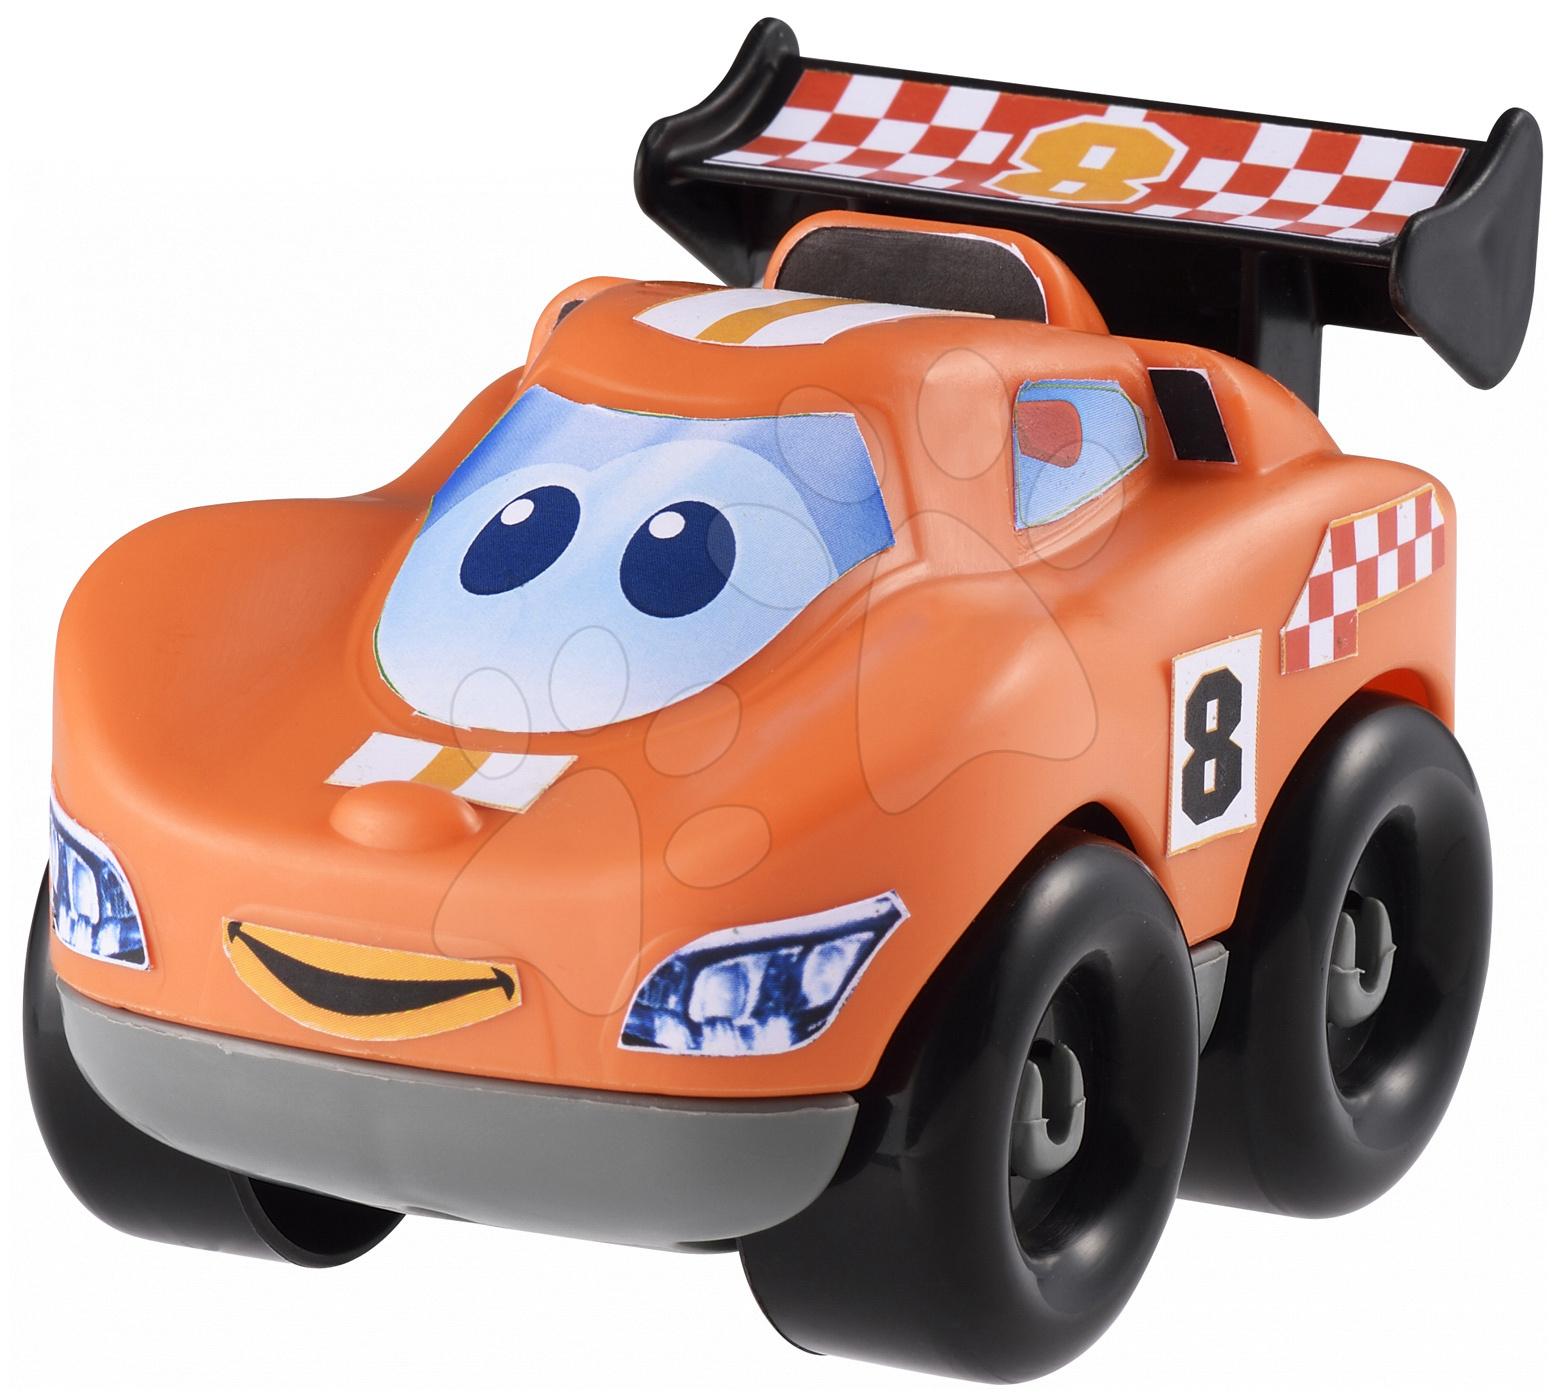 Stavebnice Abrick - Pretekárske autíčko Abrick Écoiffier oranžové od 18 mes